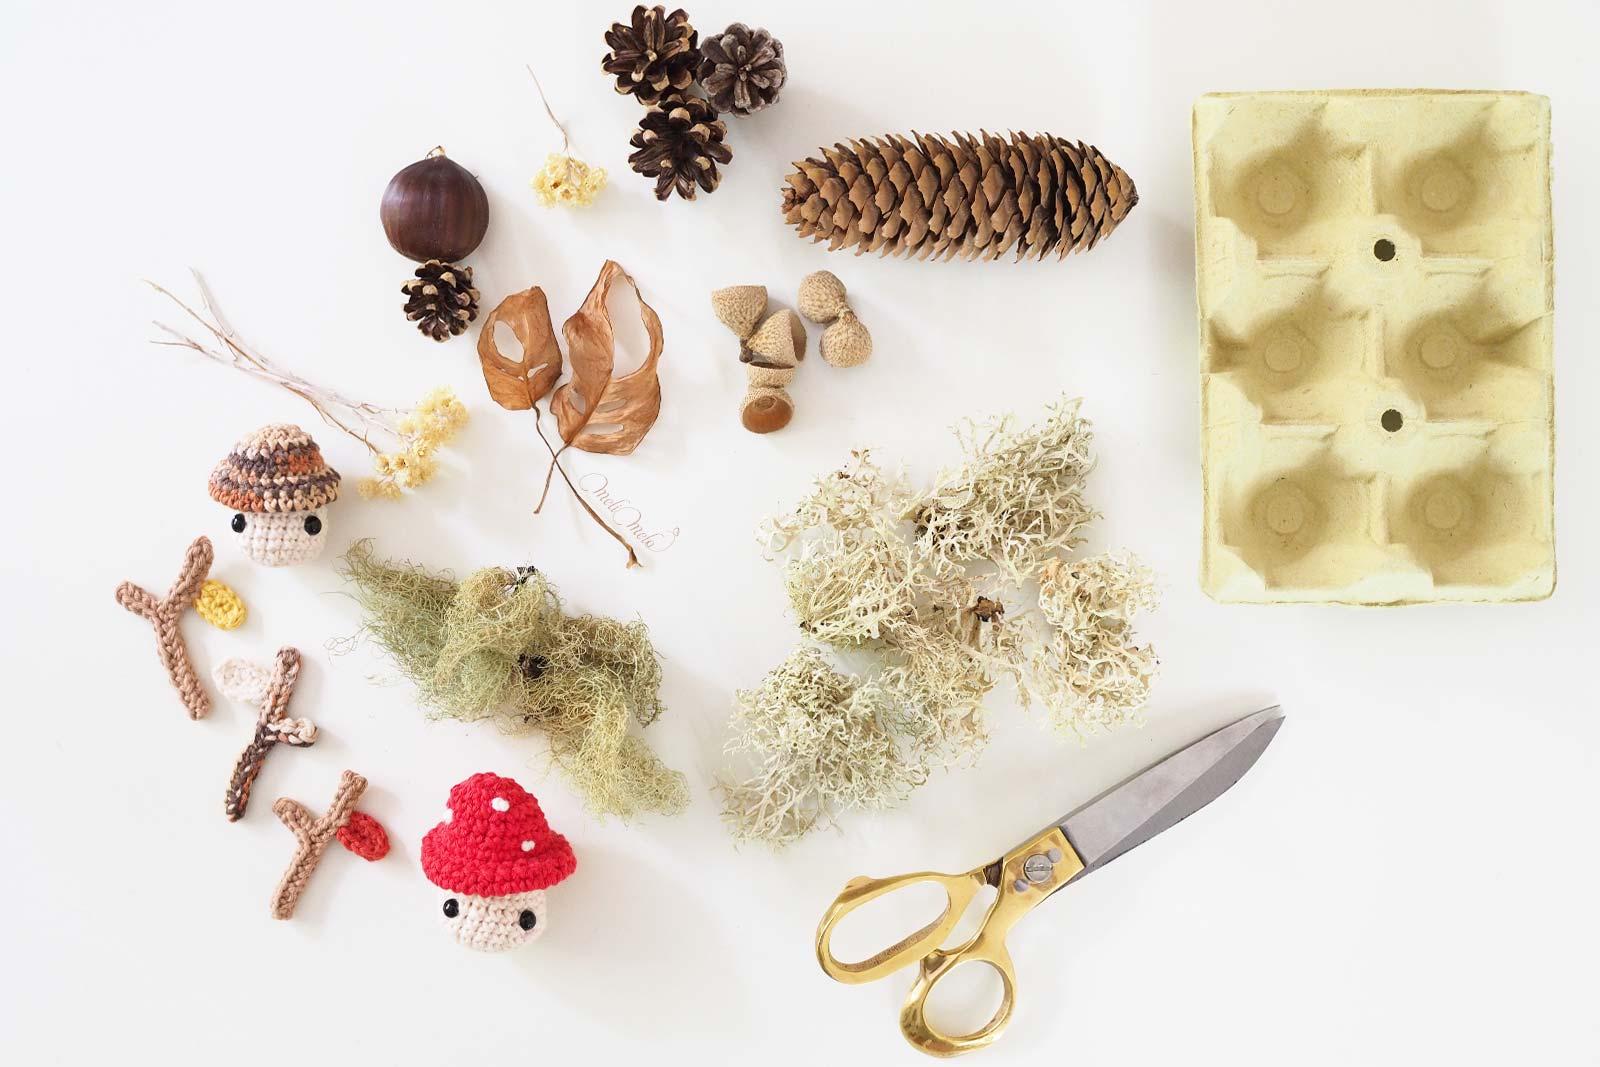 materiel-tresor-nature-deco-automne-amigurumi-champignon-laboutiquedemelimelo